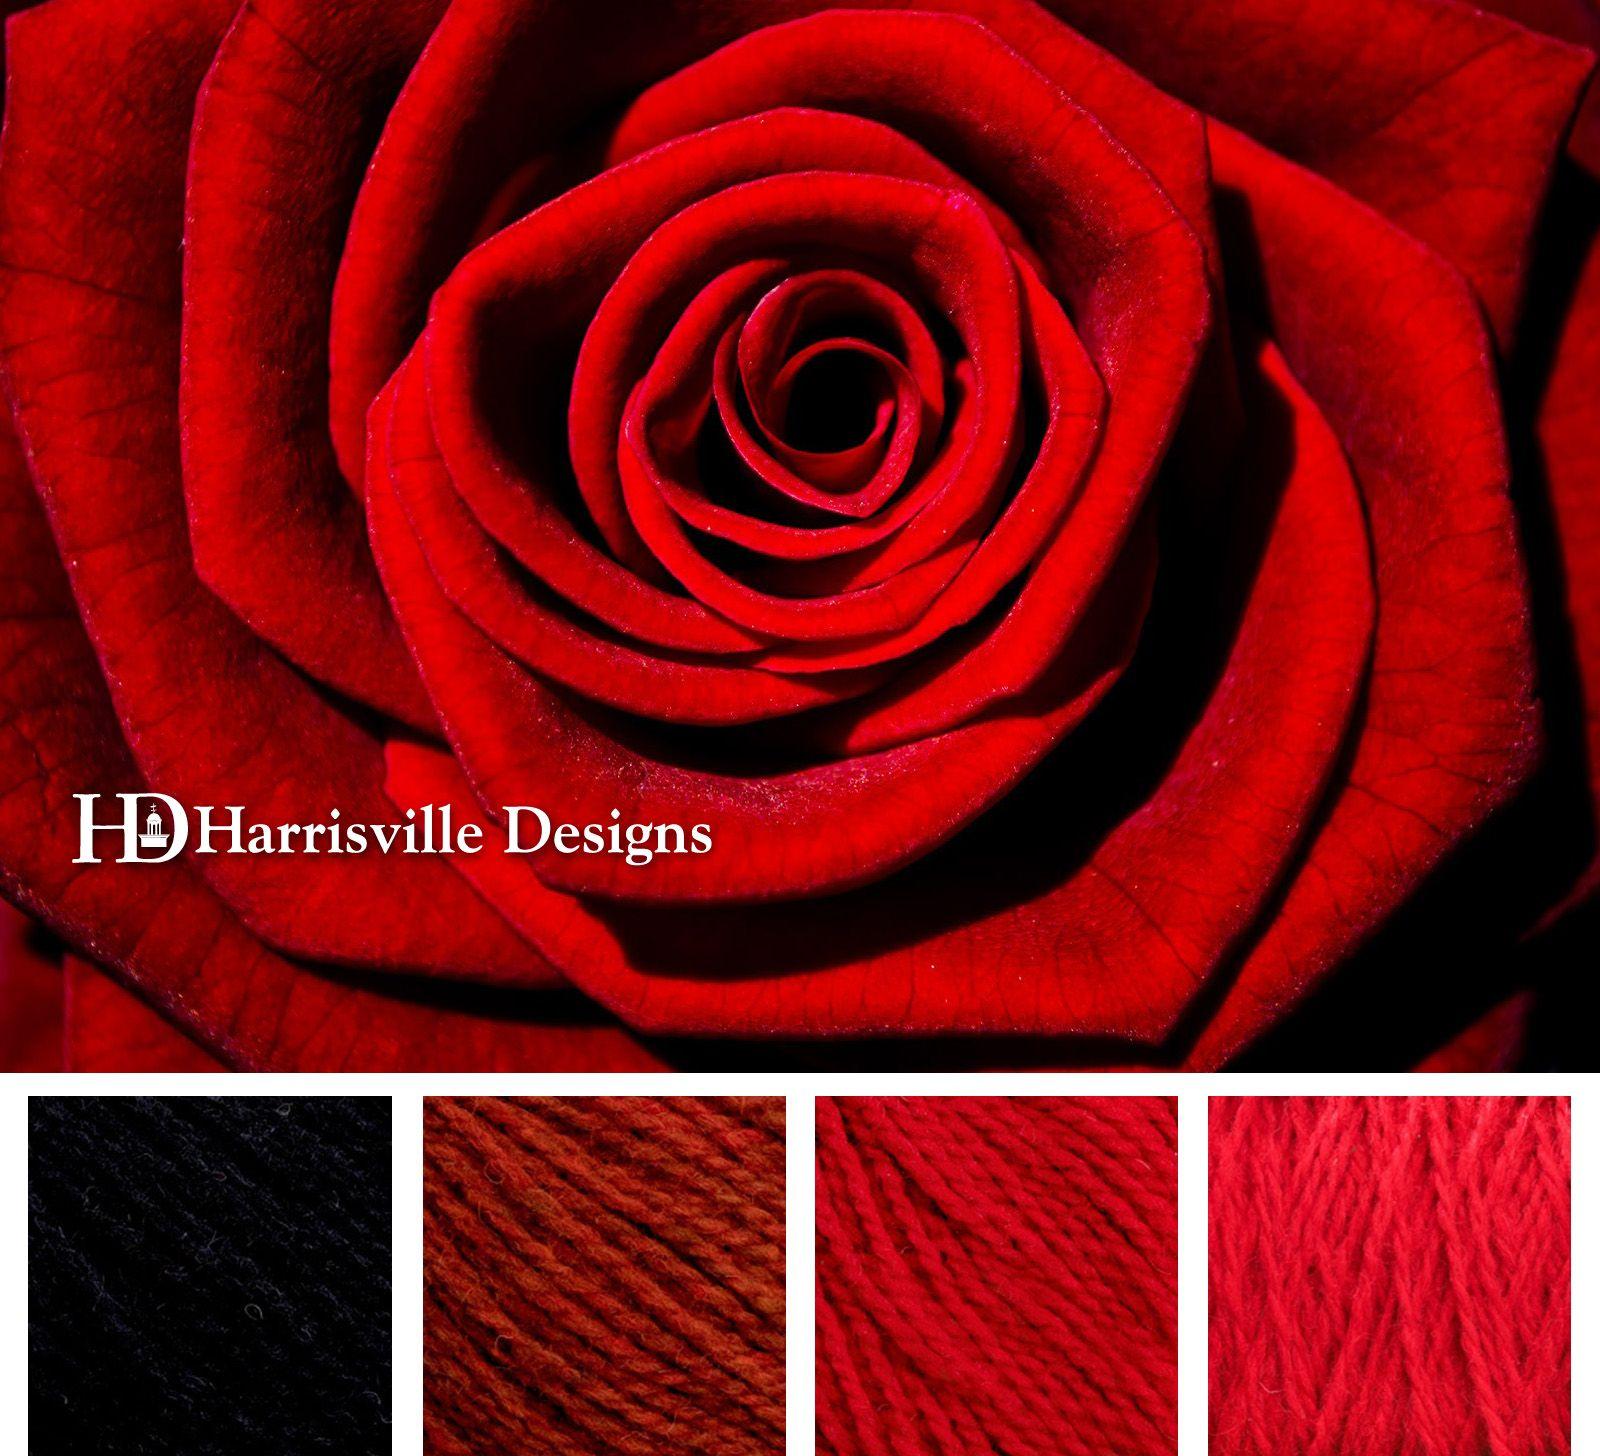 Rose color palette featuring Harrisville Designs SHETLAND yarn ...